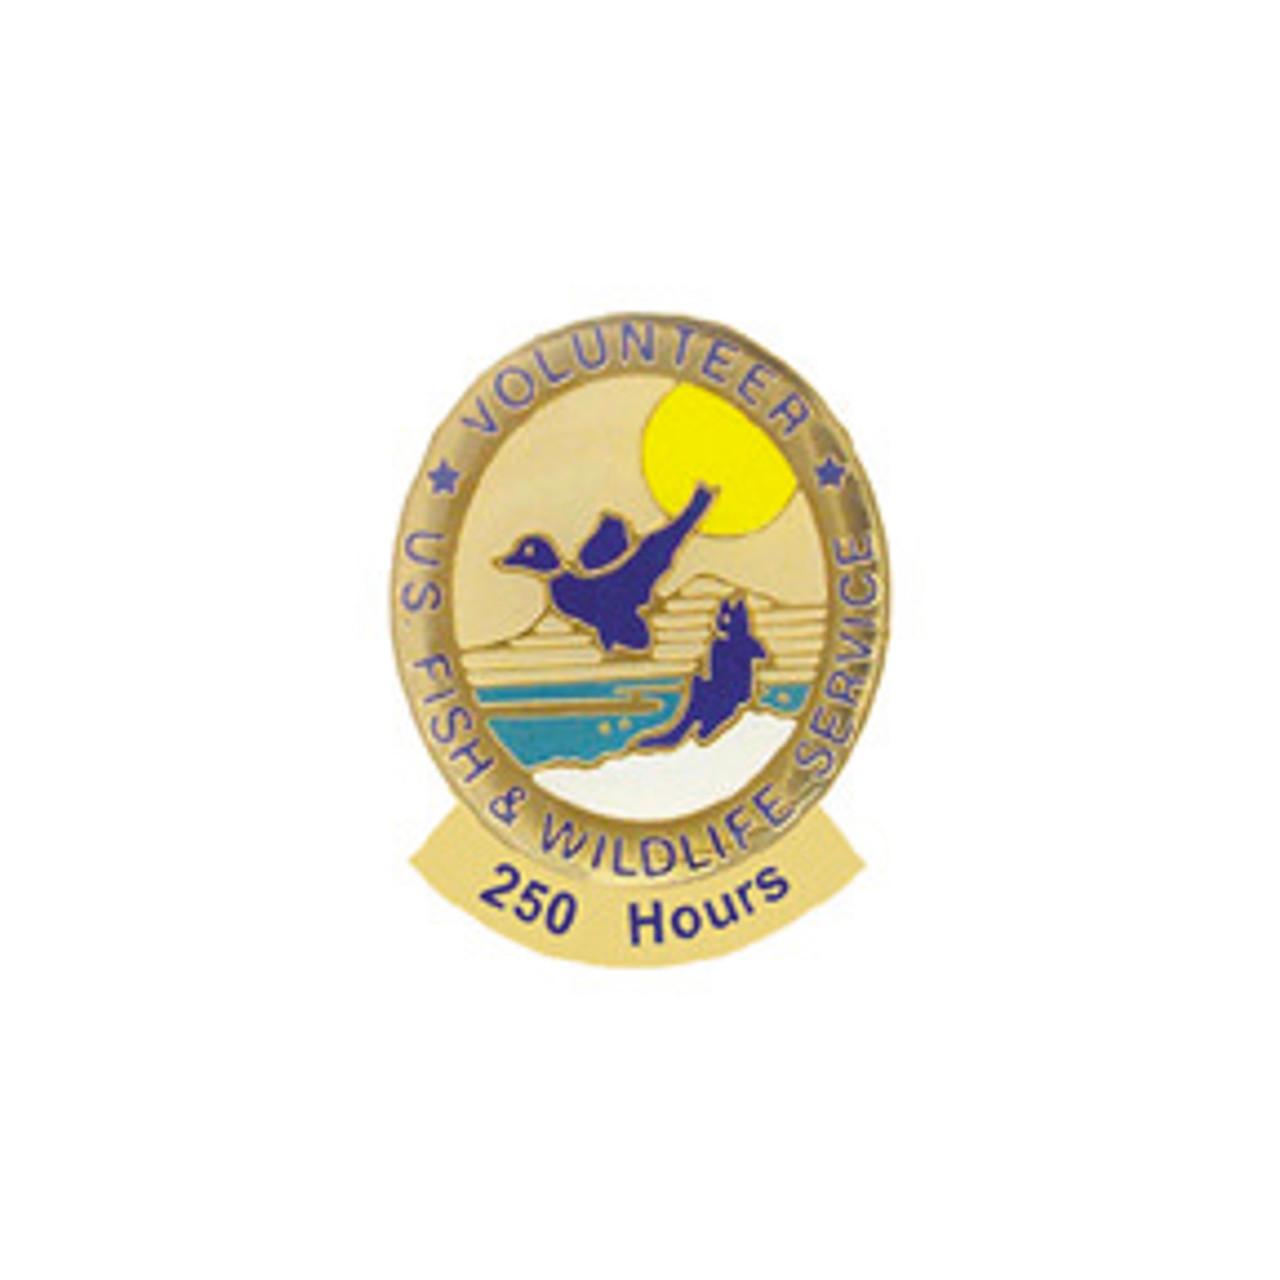 Fish & Wildlife Volunteer Hours Pin (1250 hours)